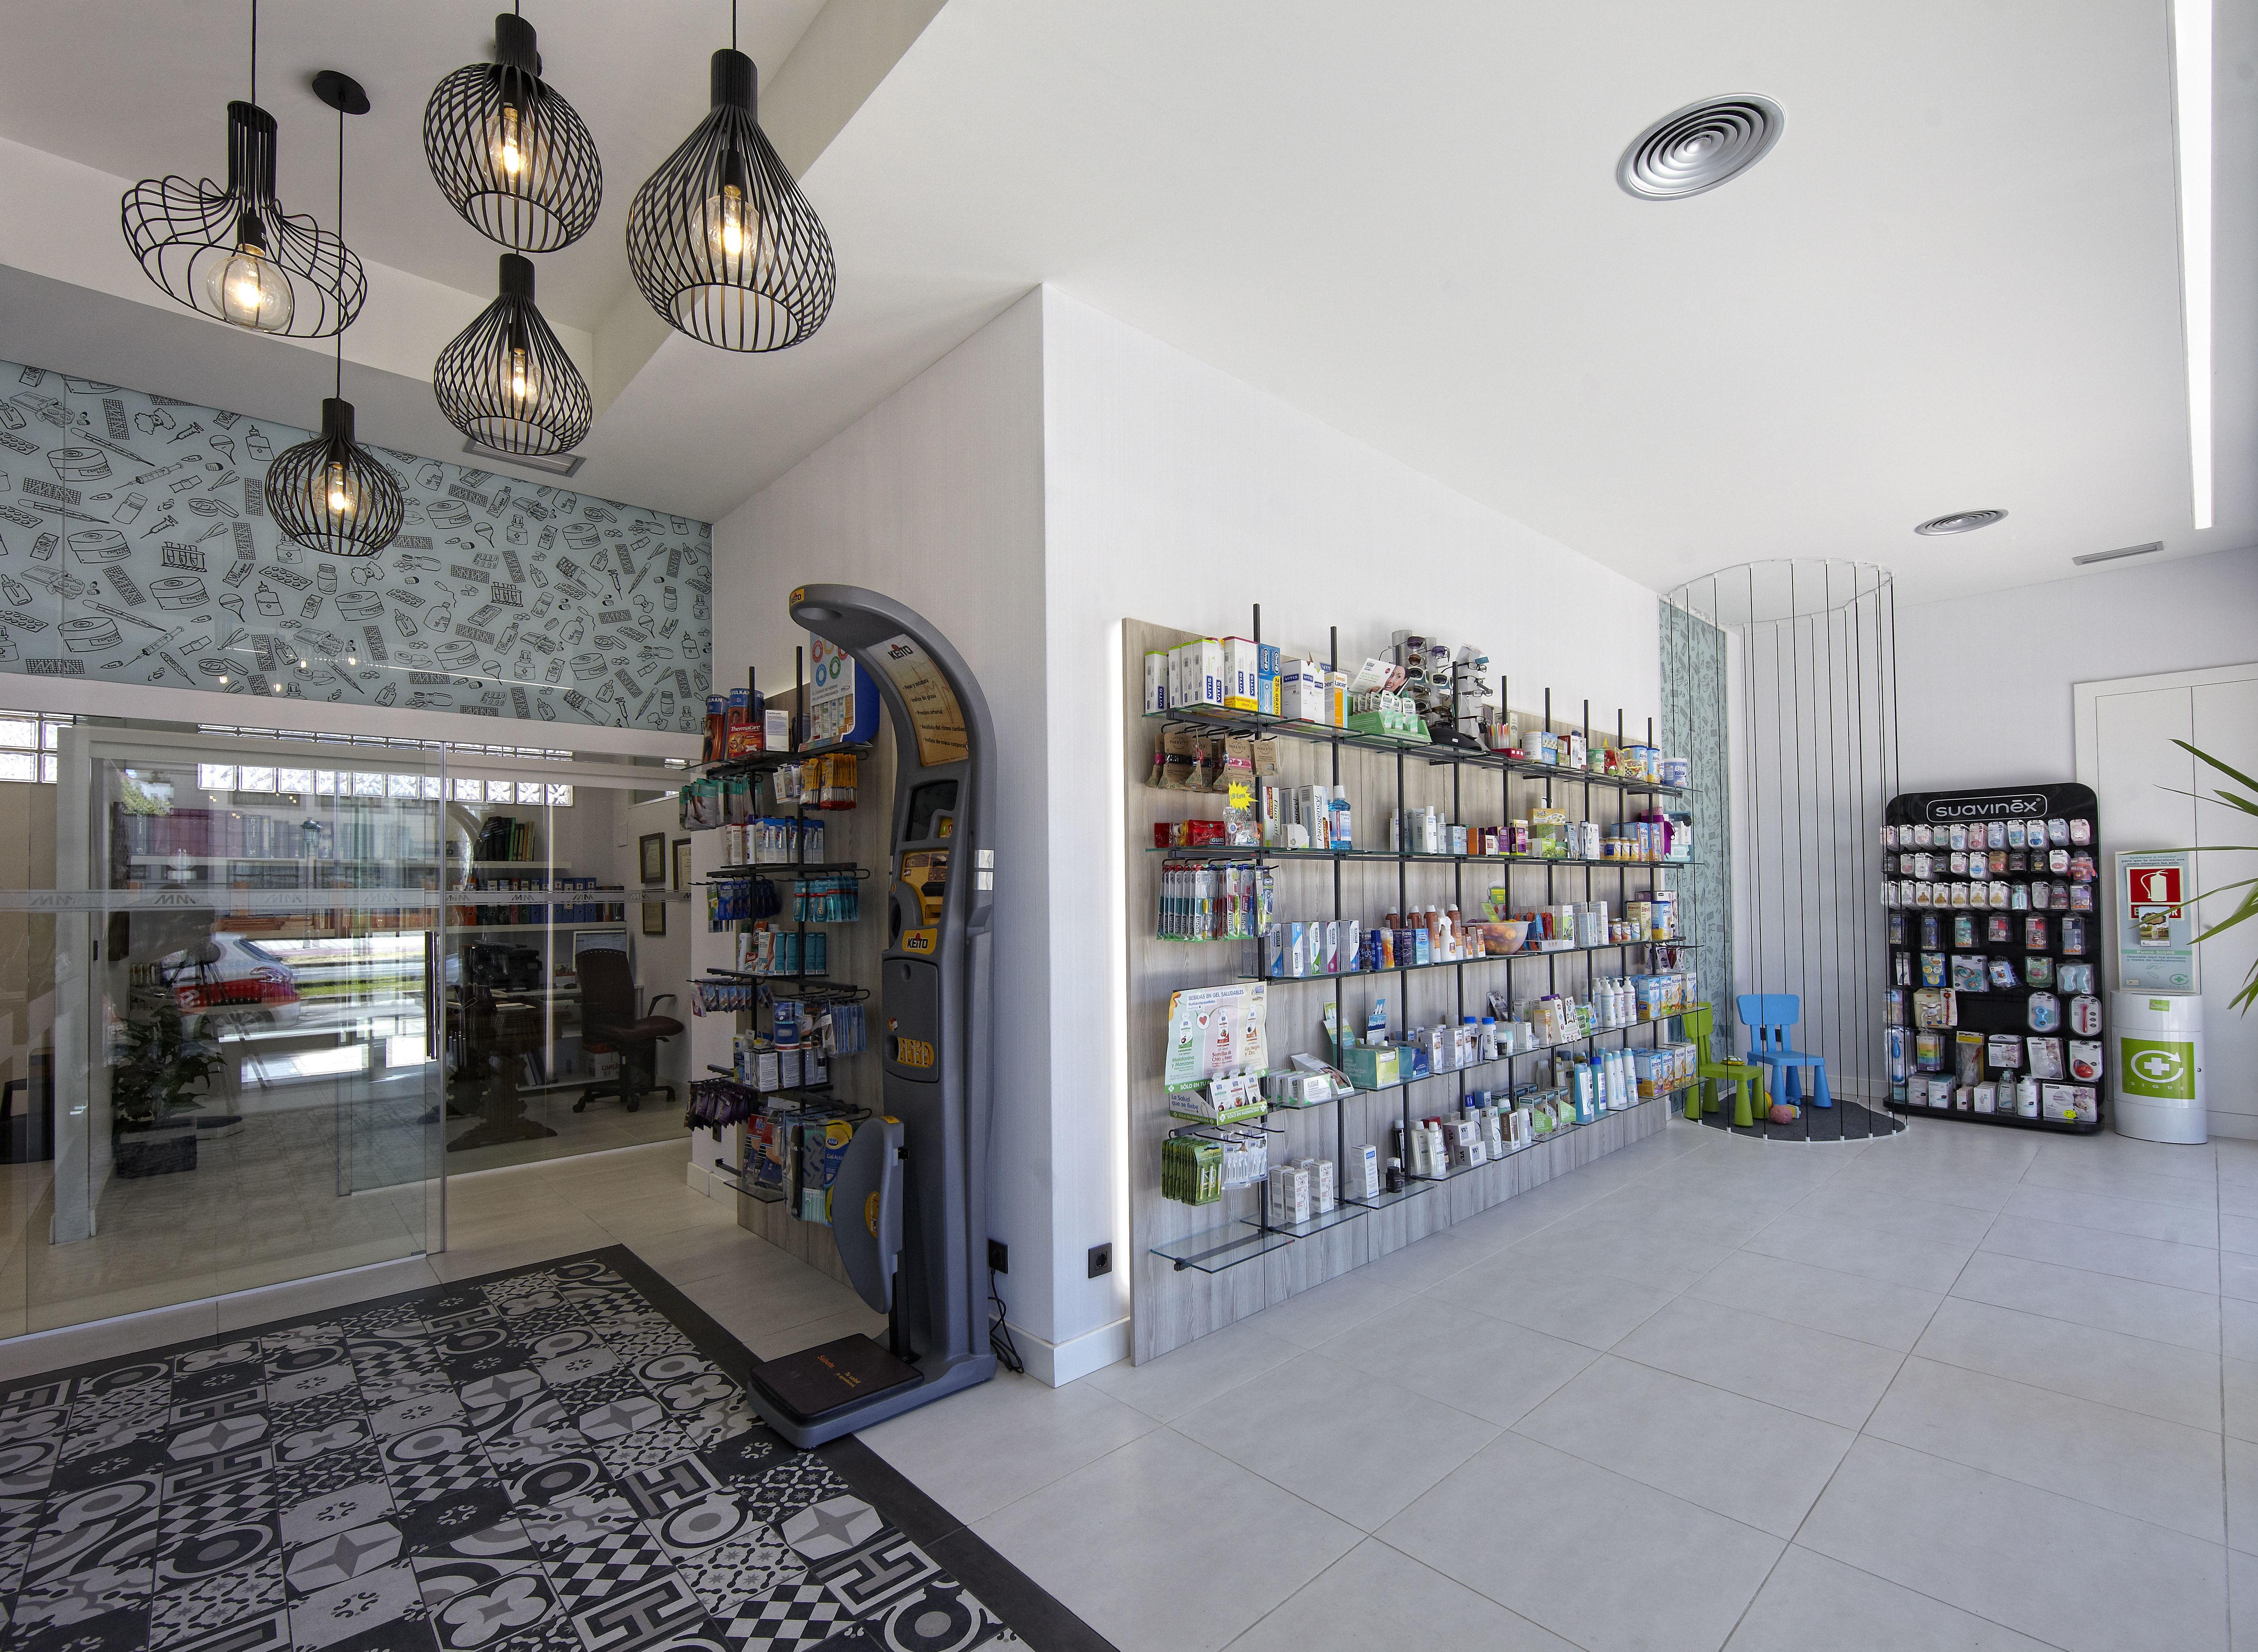 Foto 8 de Farmacias en Burgos | Farmacia Margarita Medrano Ruiz